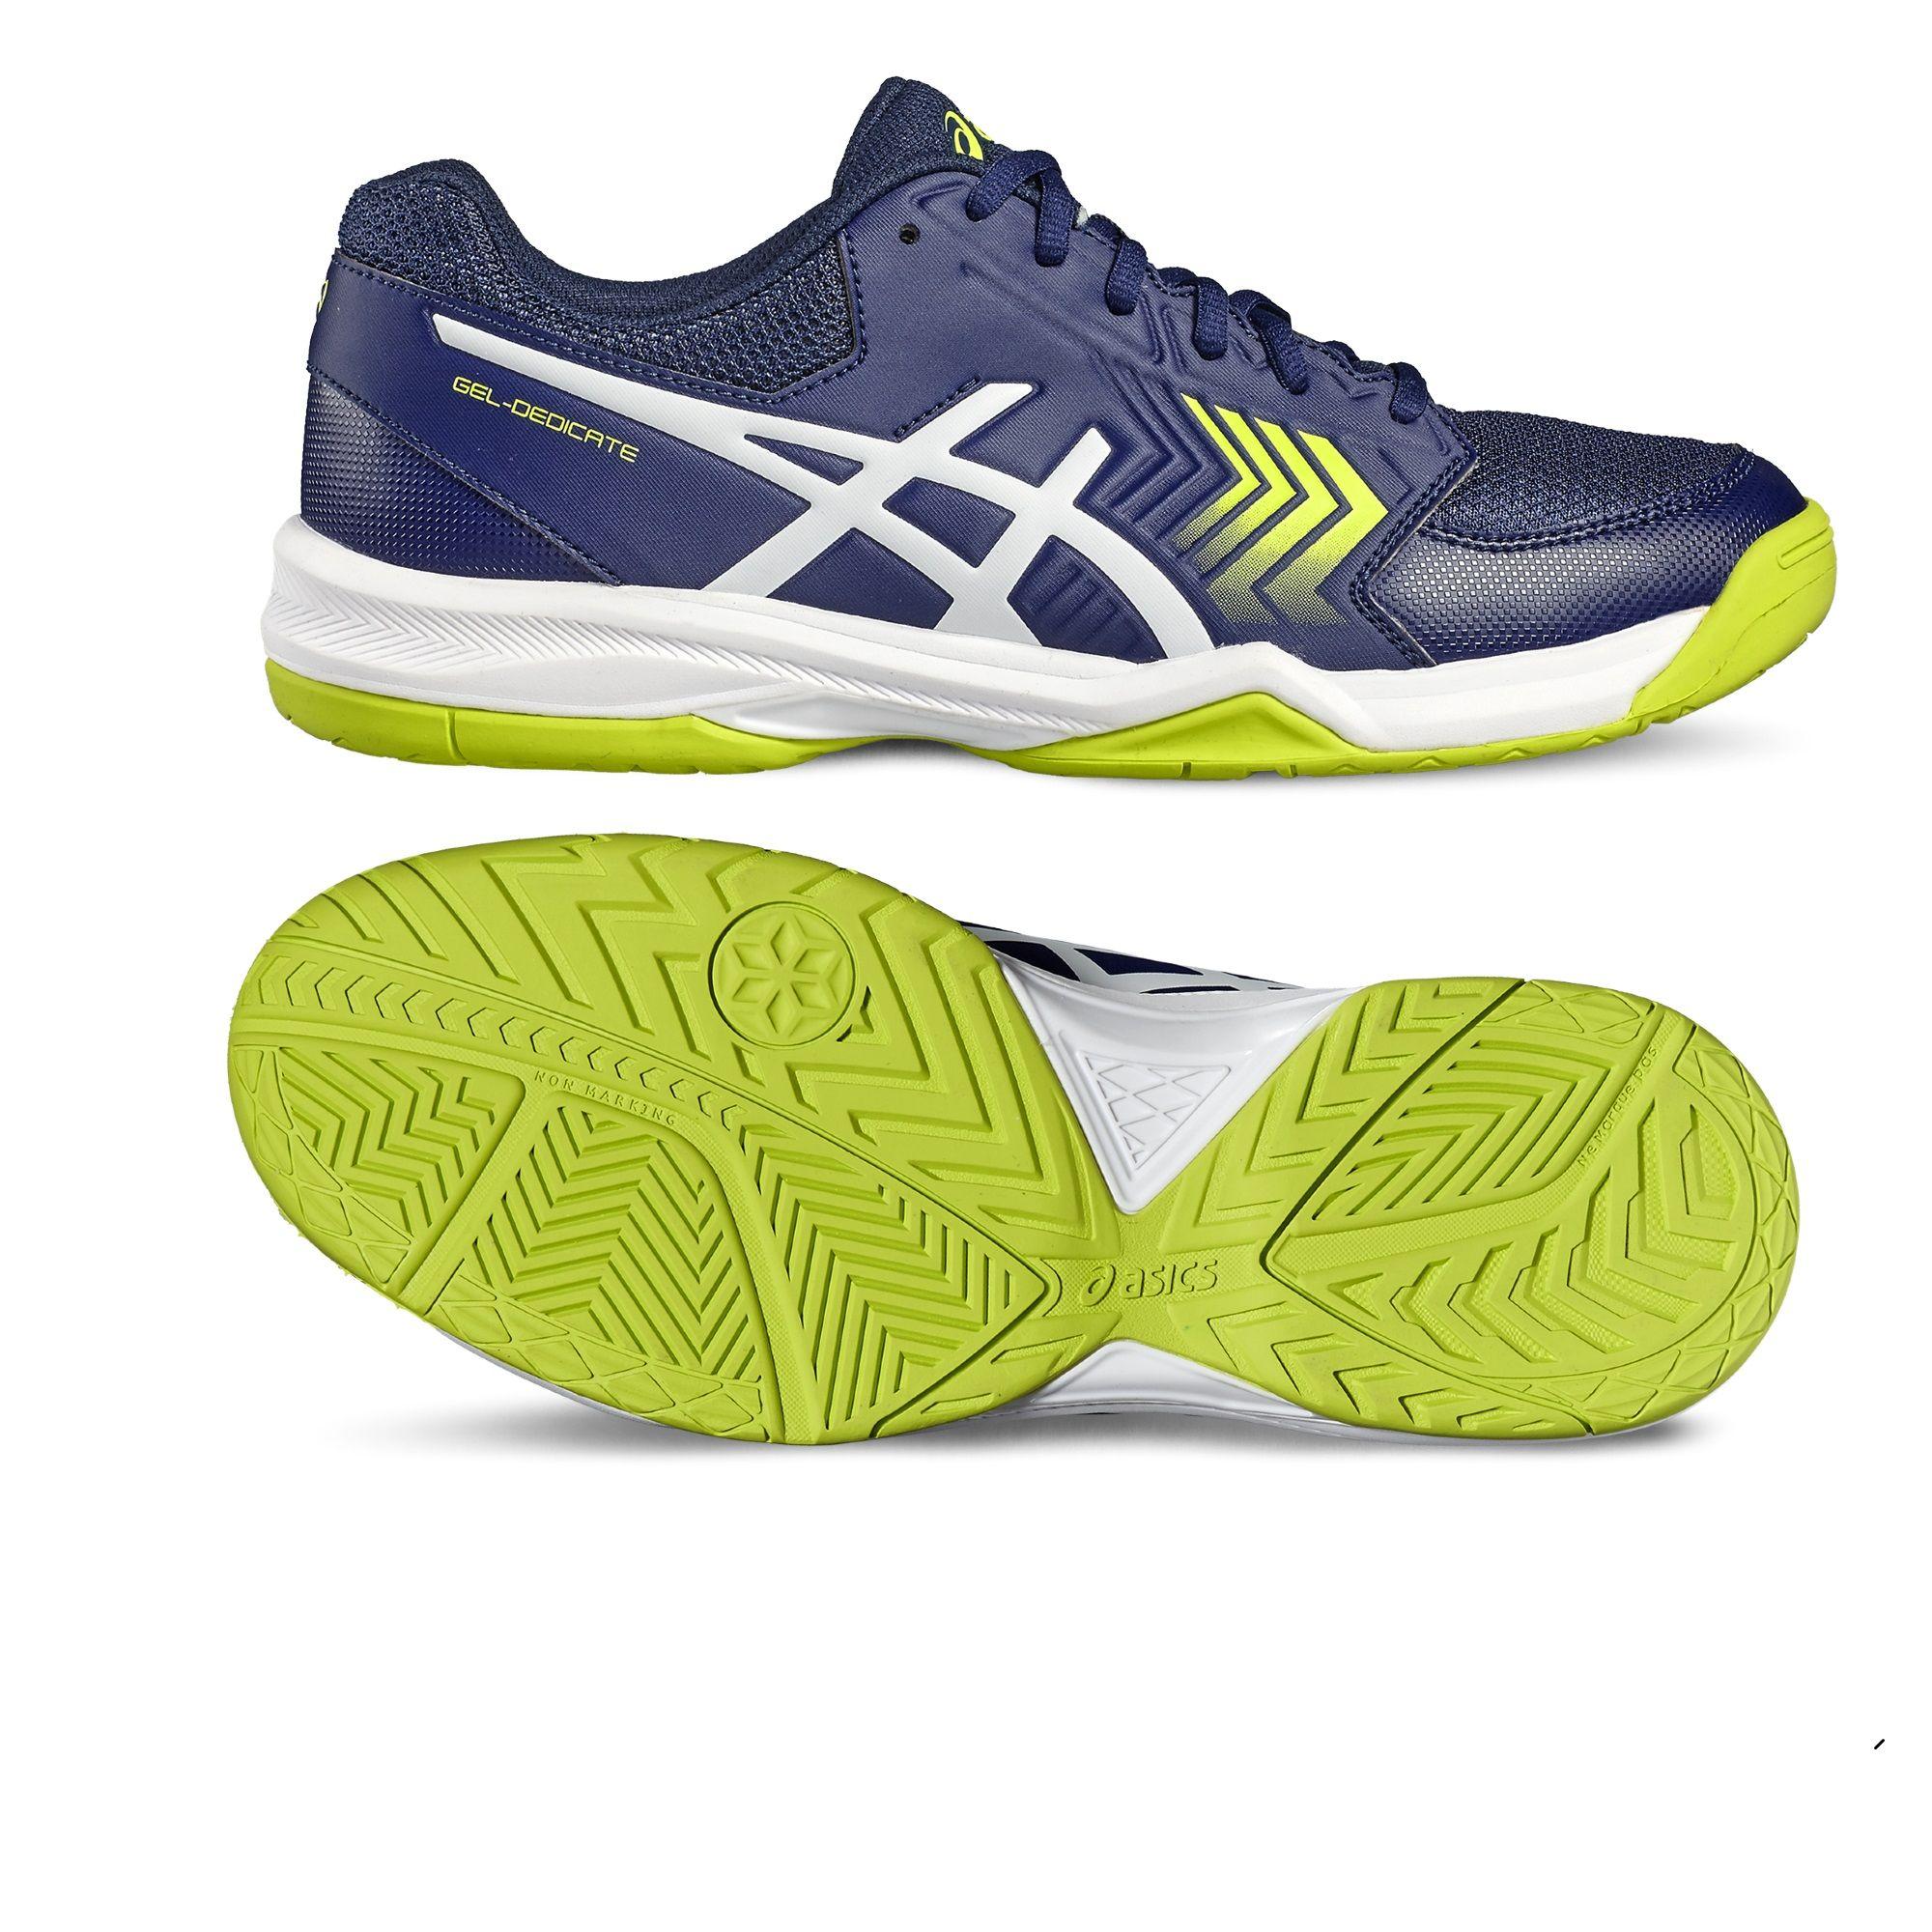 Asics Mens Mesh Tennis Shoes